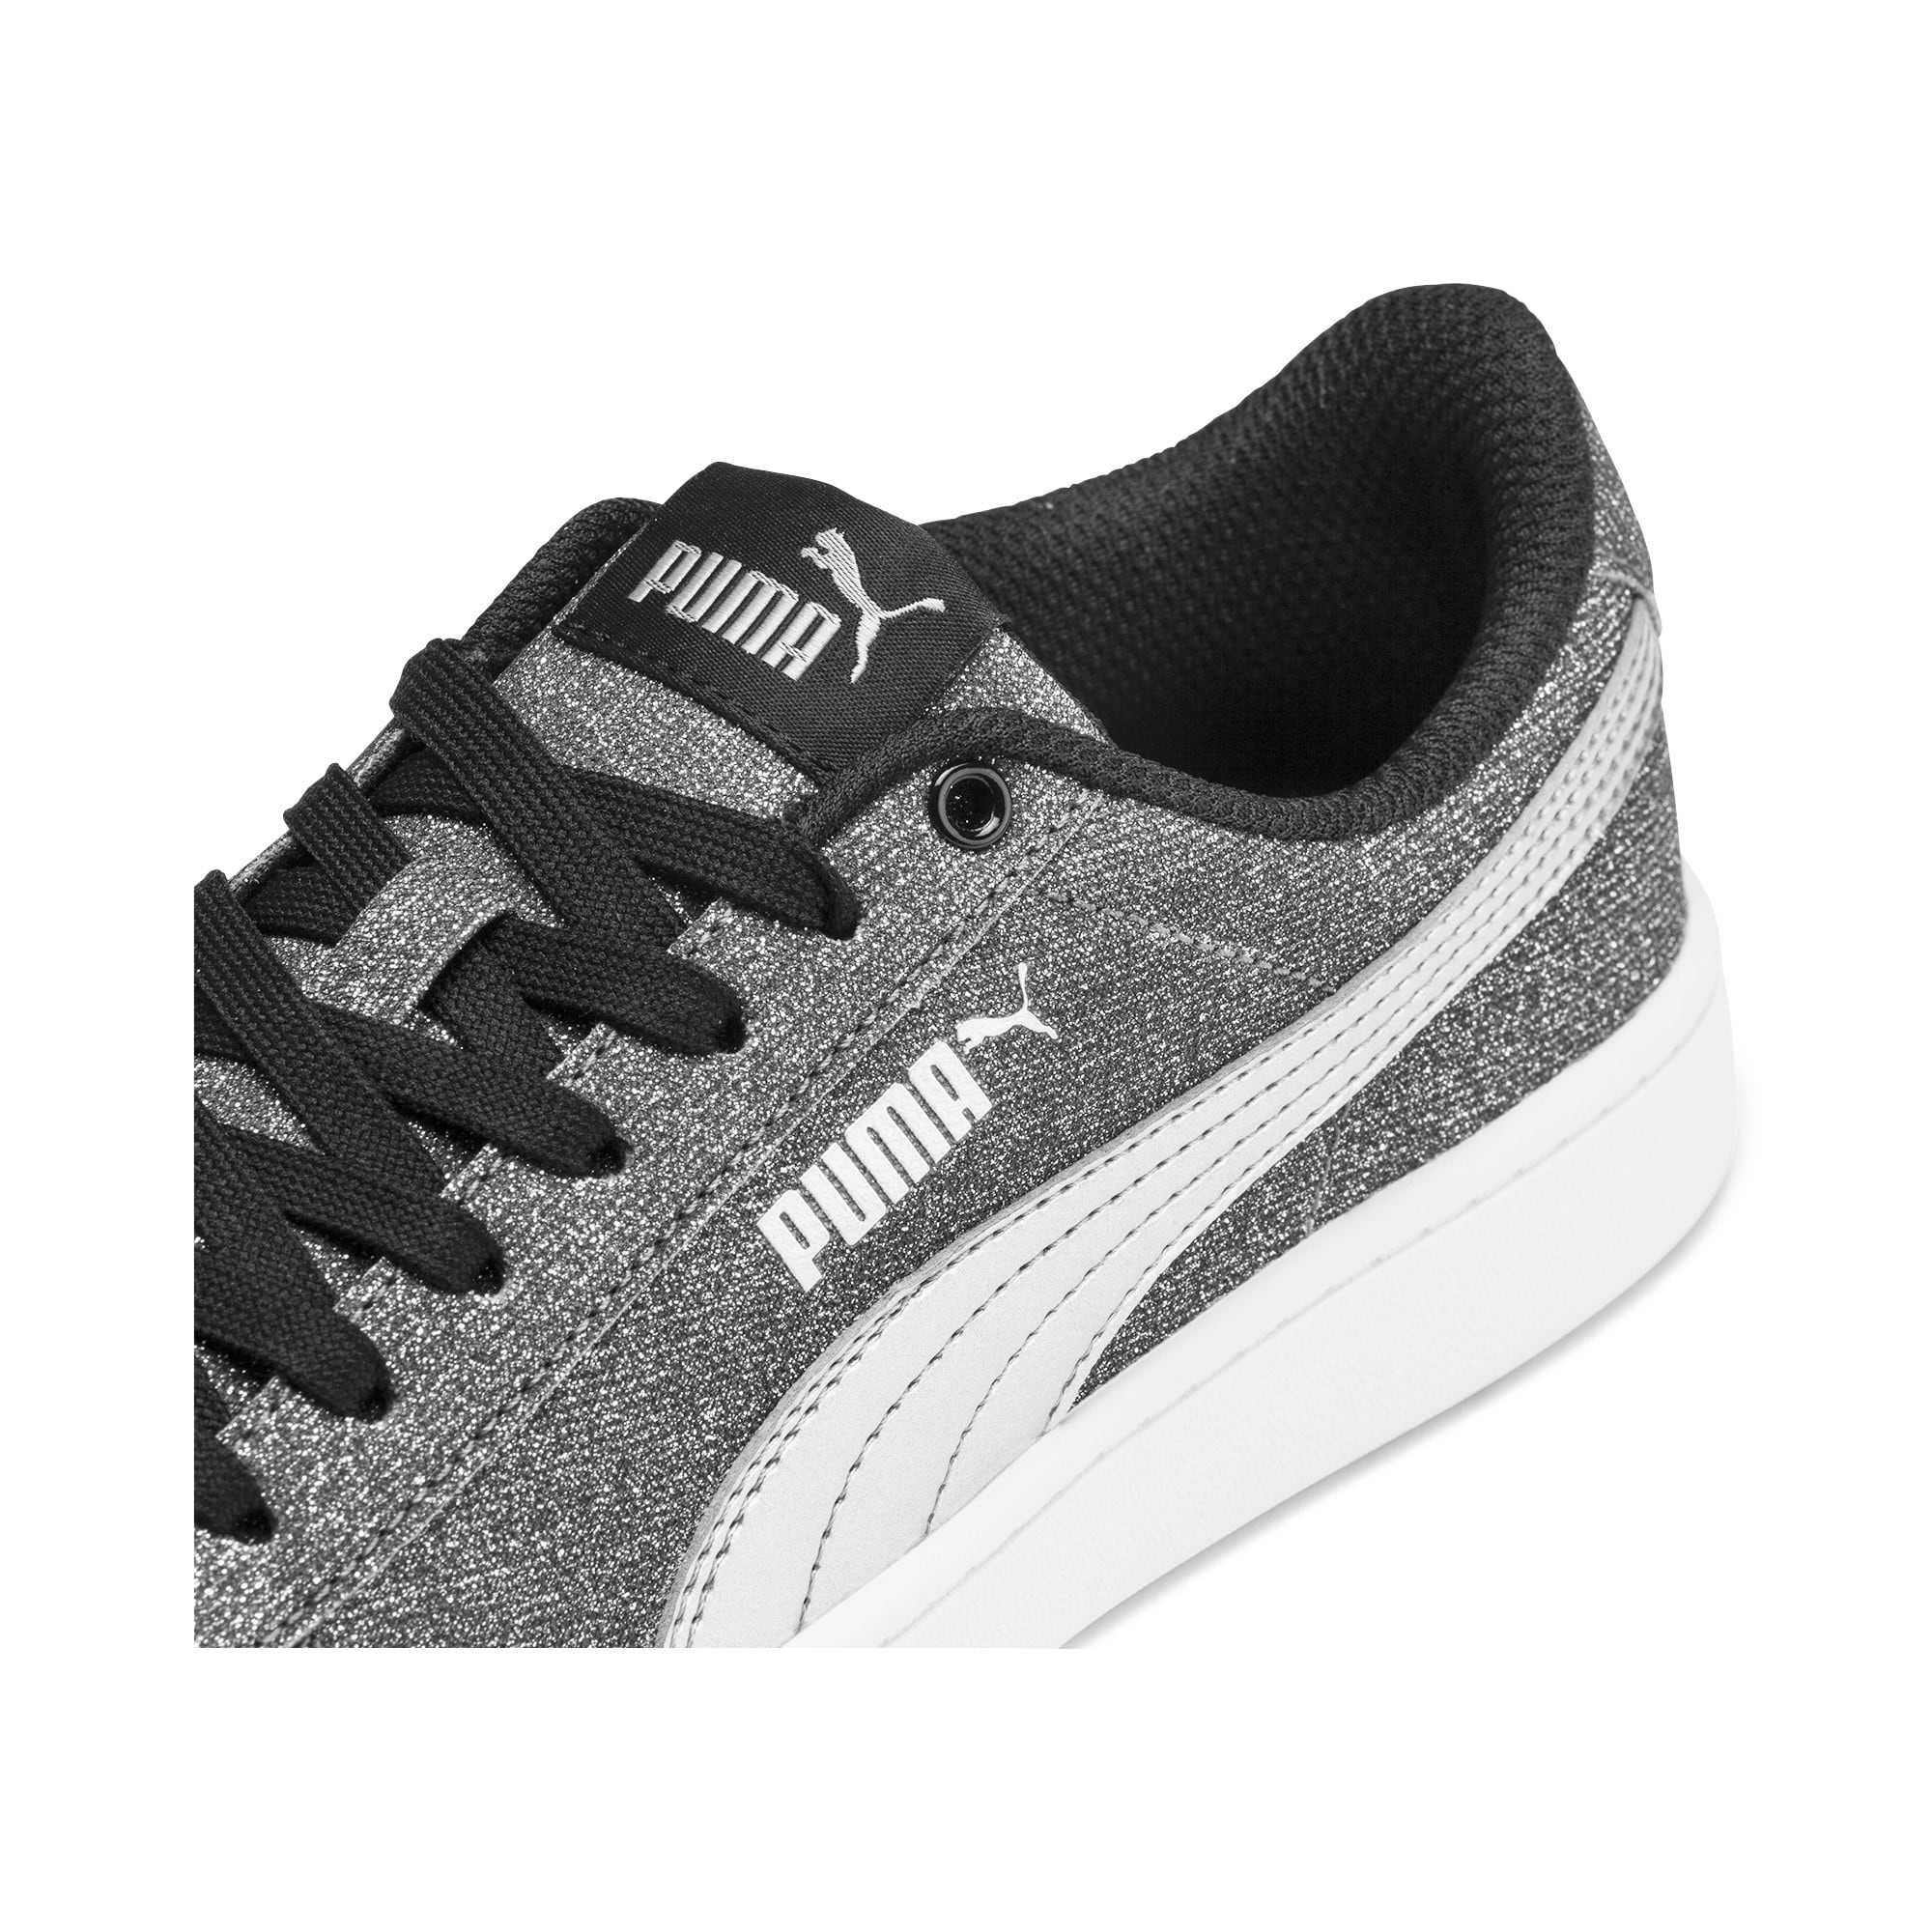 Thumbnail 7 of PUMA Vikky v2 Glitz Sneakers JR, Puma Black-Puma Silver-White, medium